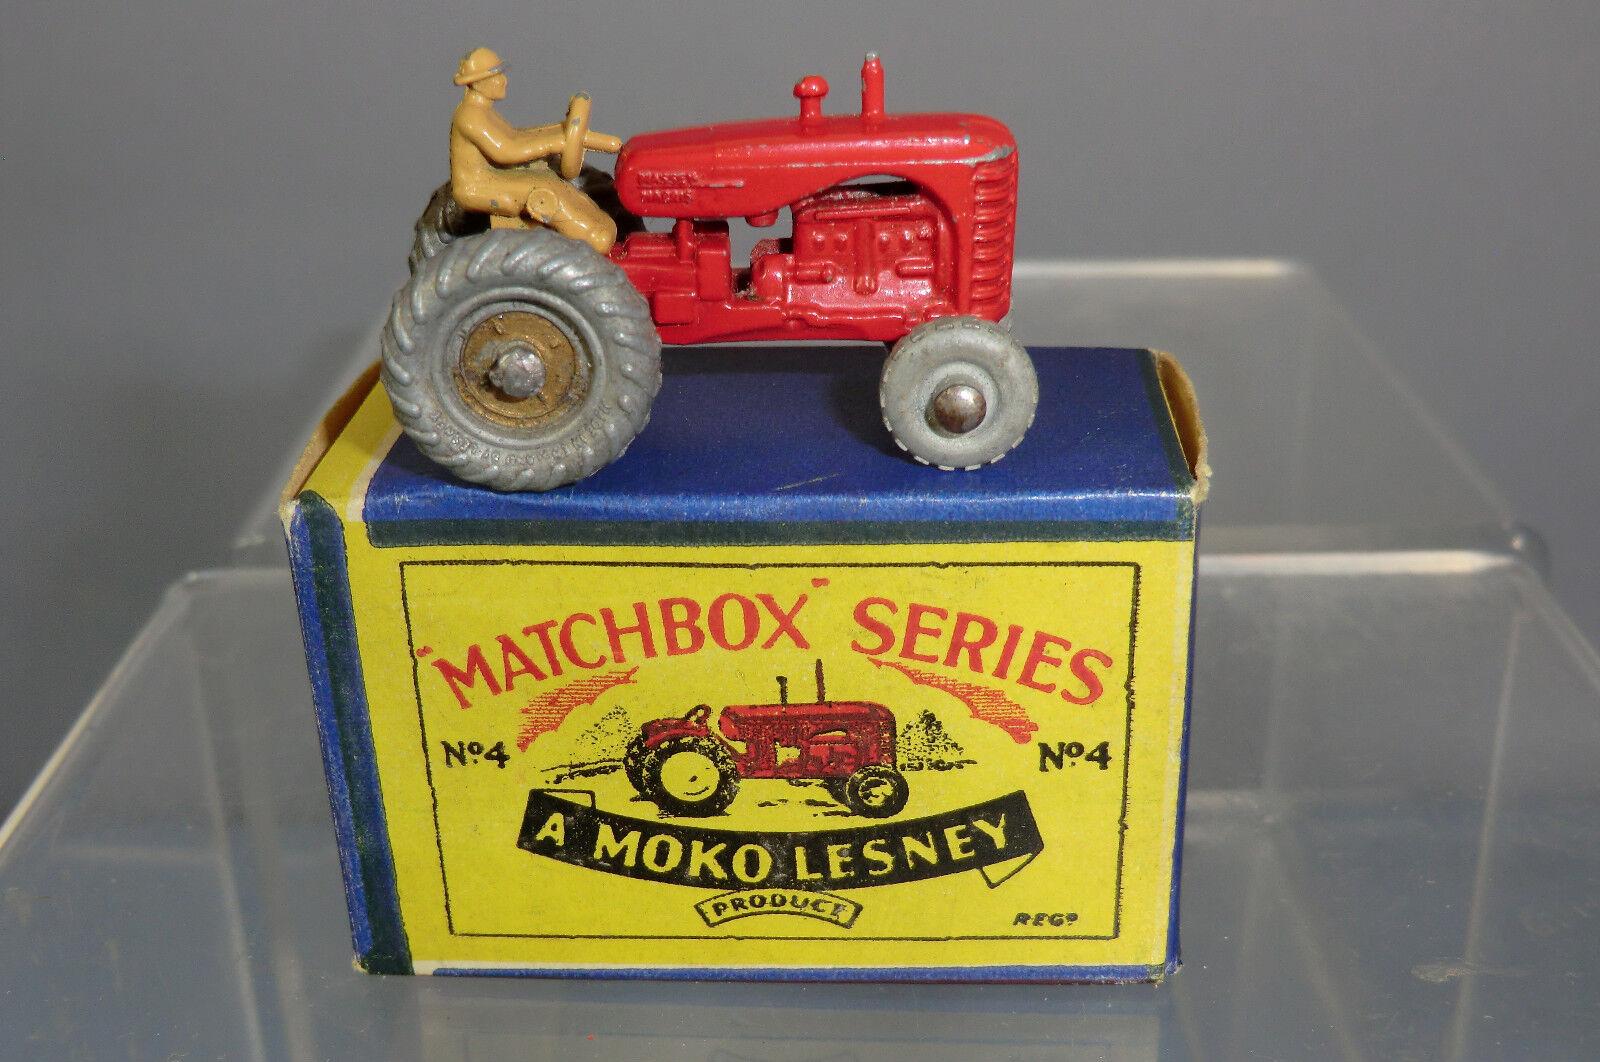 MATCHBOX MOKO LESNEY MODEL No.4b MASSEY-HARRIS TRACTOR  NO MUDGUARDS    VN MIB